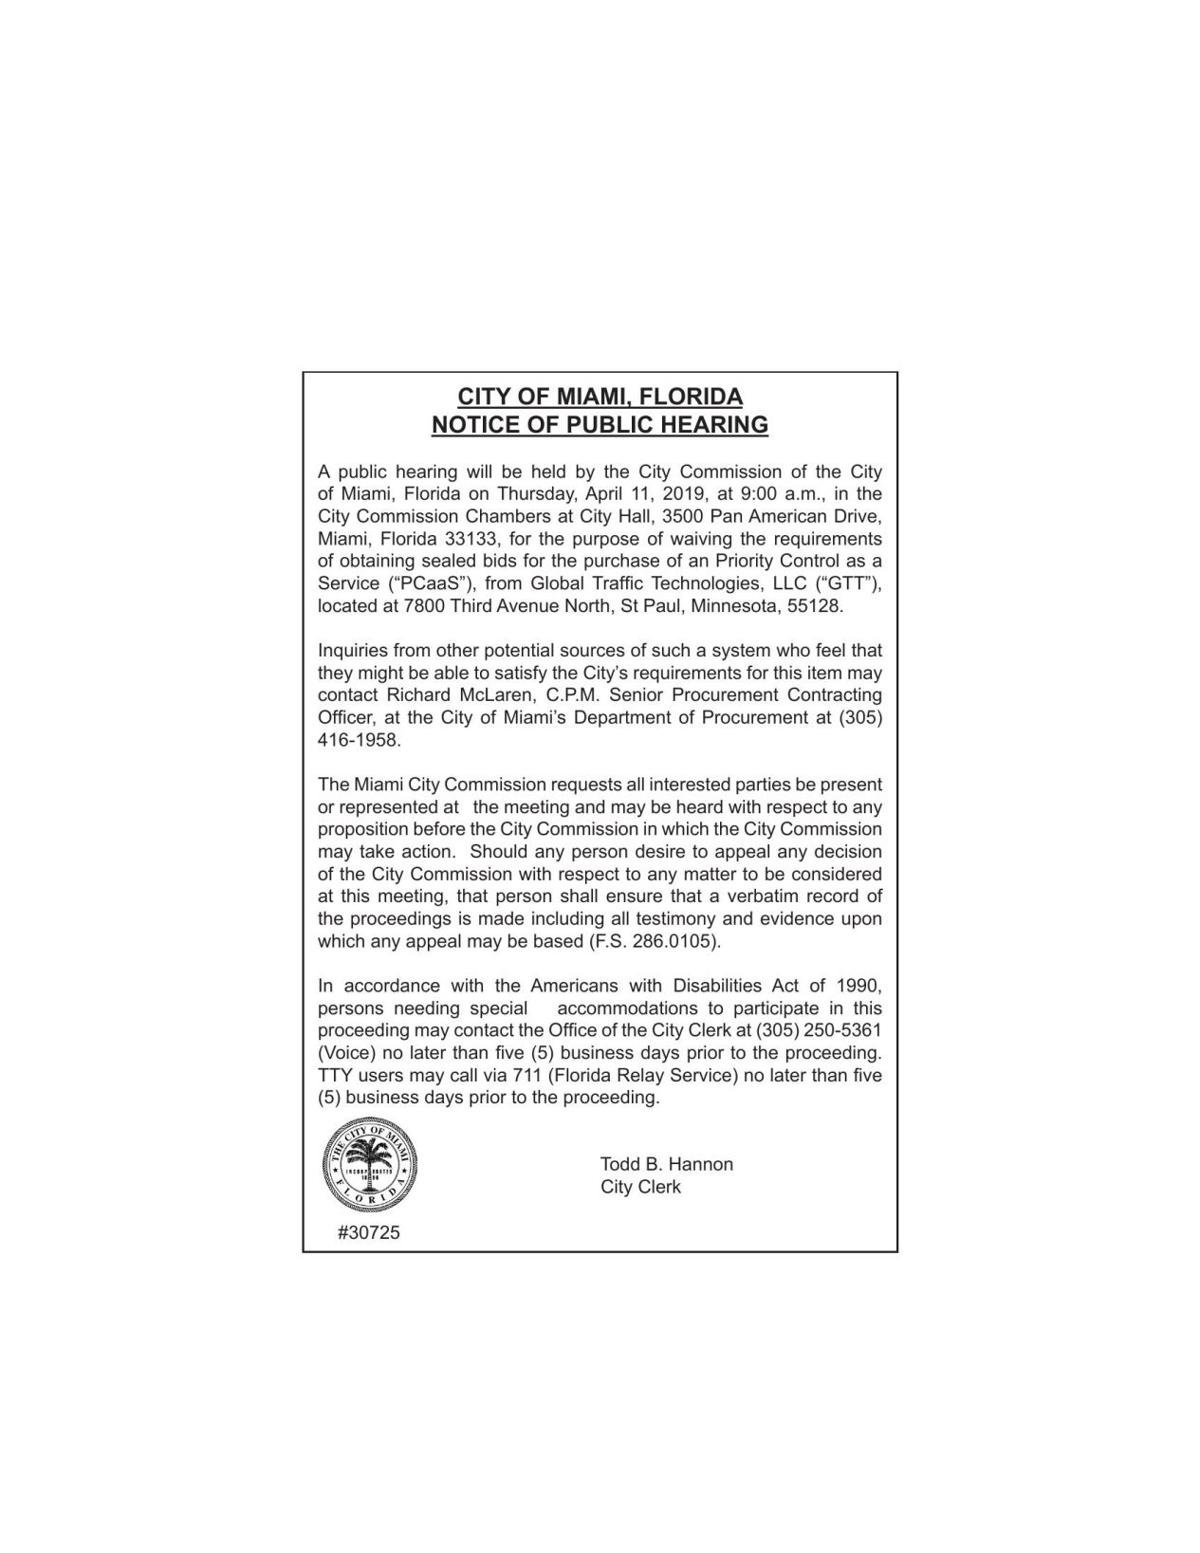 CITY OF MIAMI, FLORIDA NOTICE OF PUBLIC HEARING